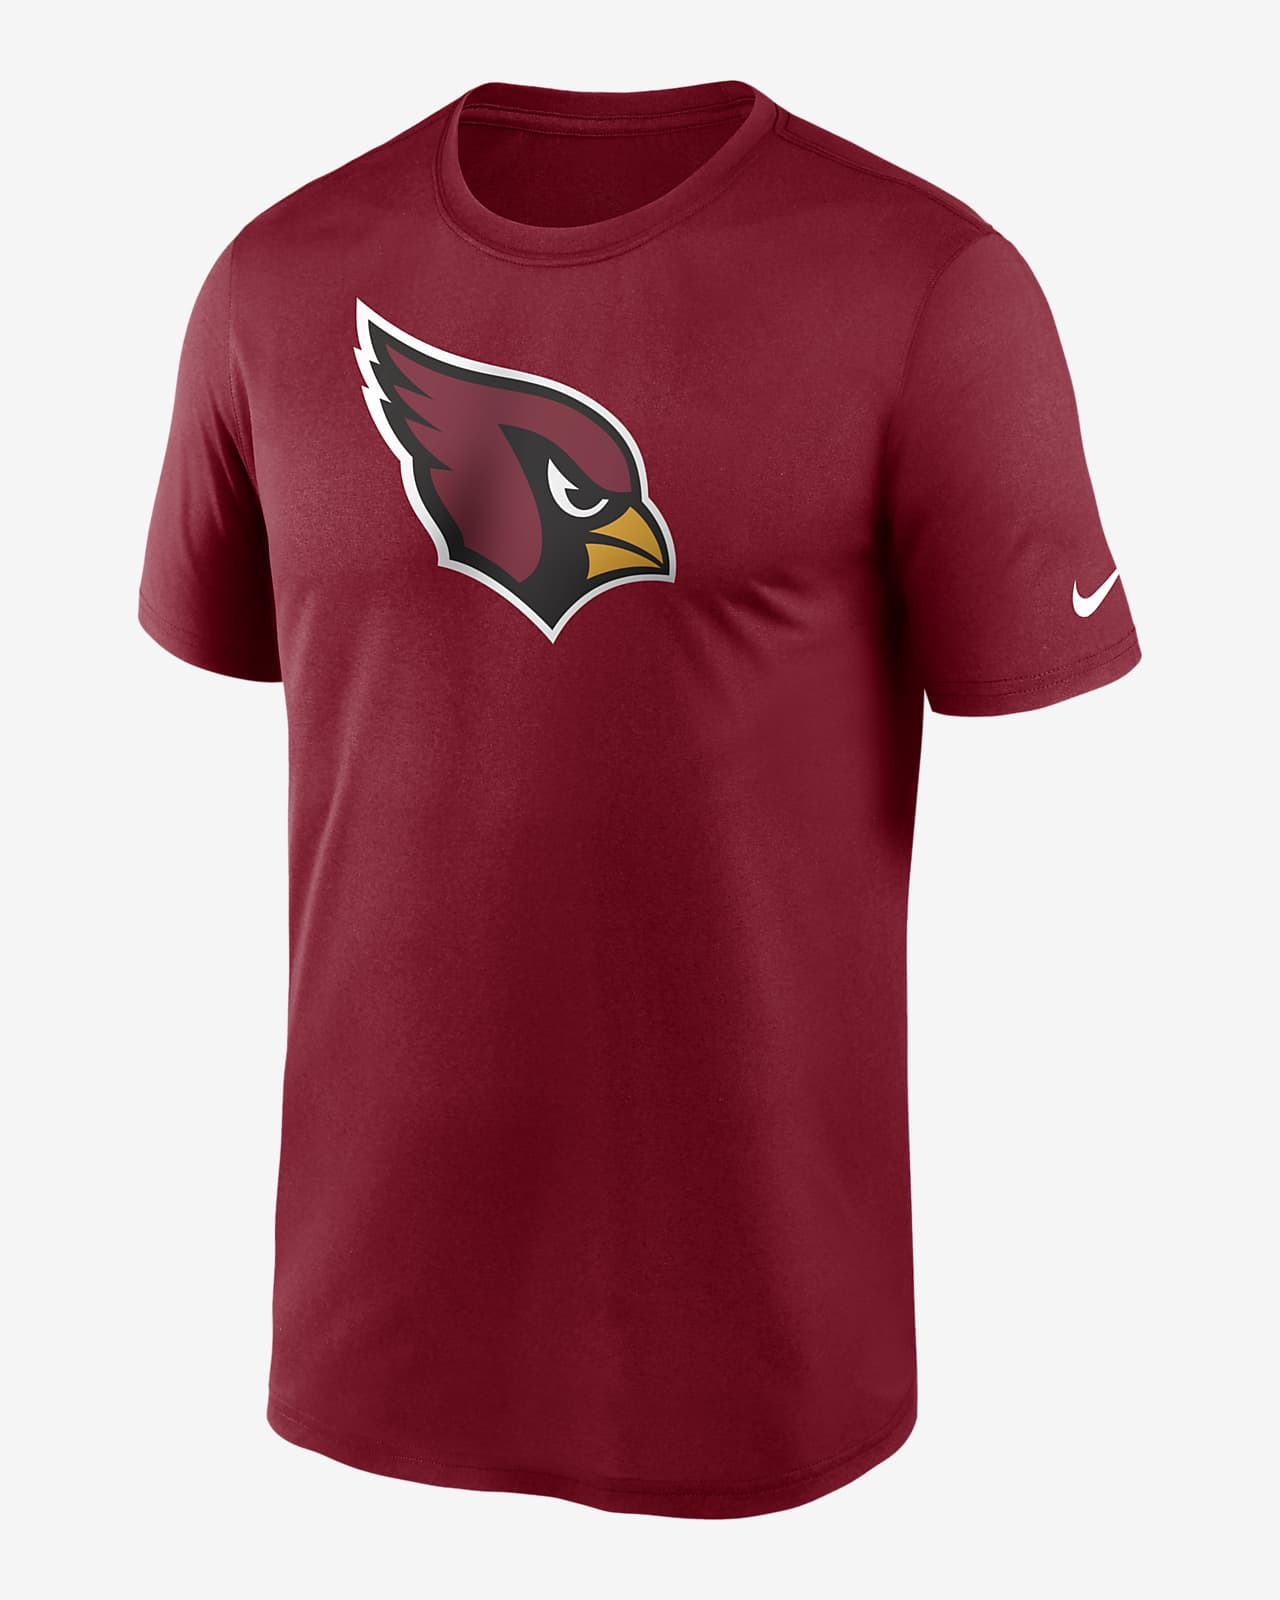 Nike Dri-FIT Logo Legend (NFL Arizona Cardinals) Men's T-Shirt